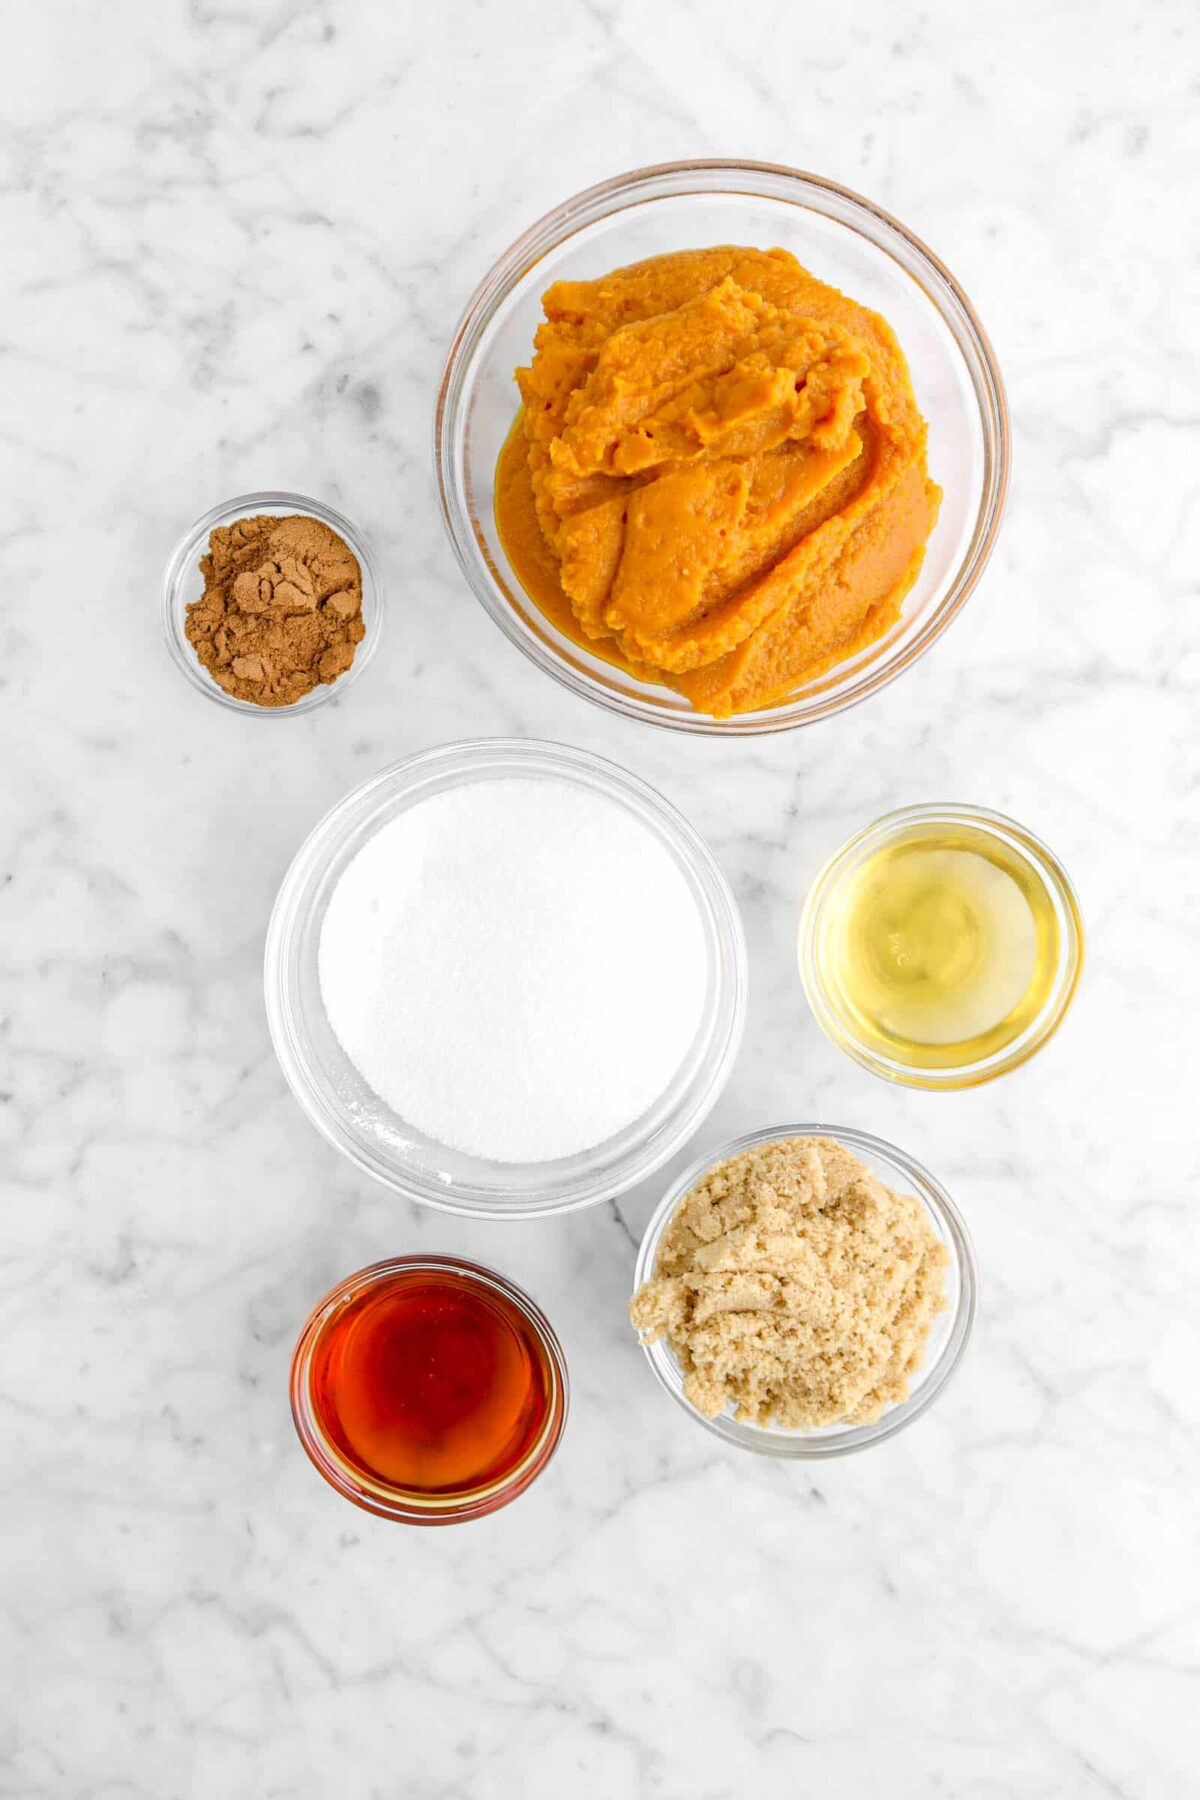 pumpkin, spice, apple cider, sugar, brown sugar, and boiled cider in glass bowls